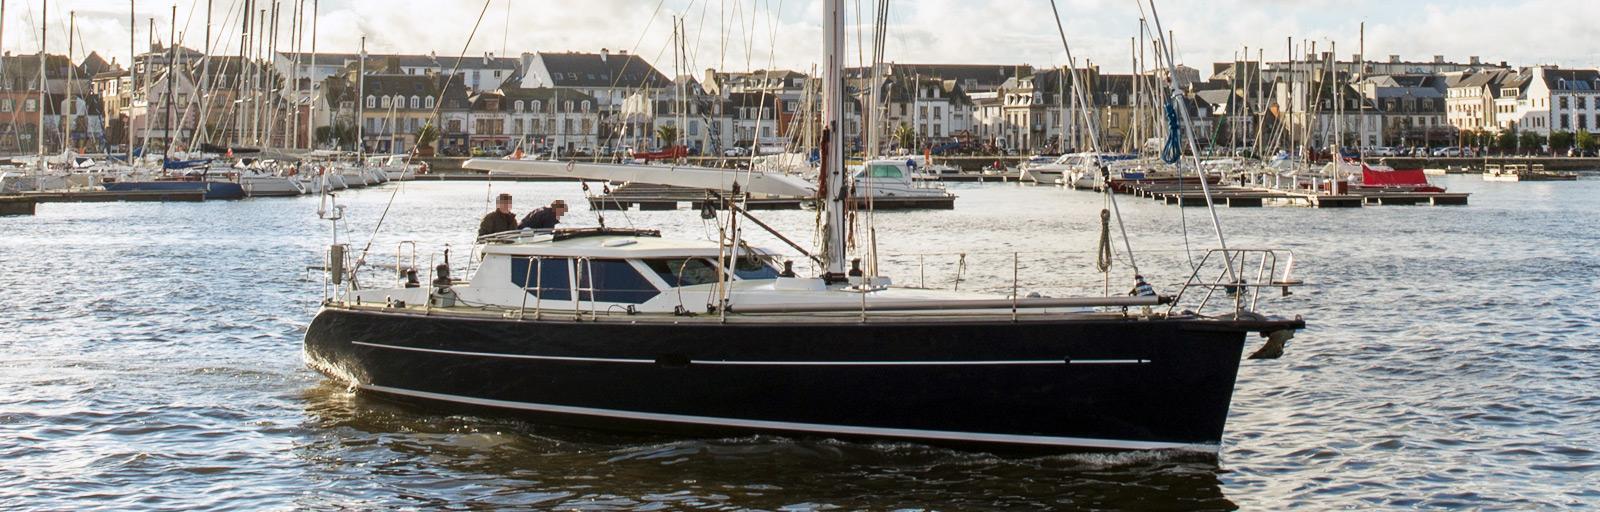 JFA 45 Deck Saloon - AYC Yachtbroker